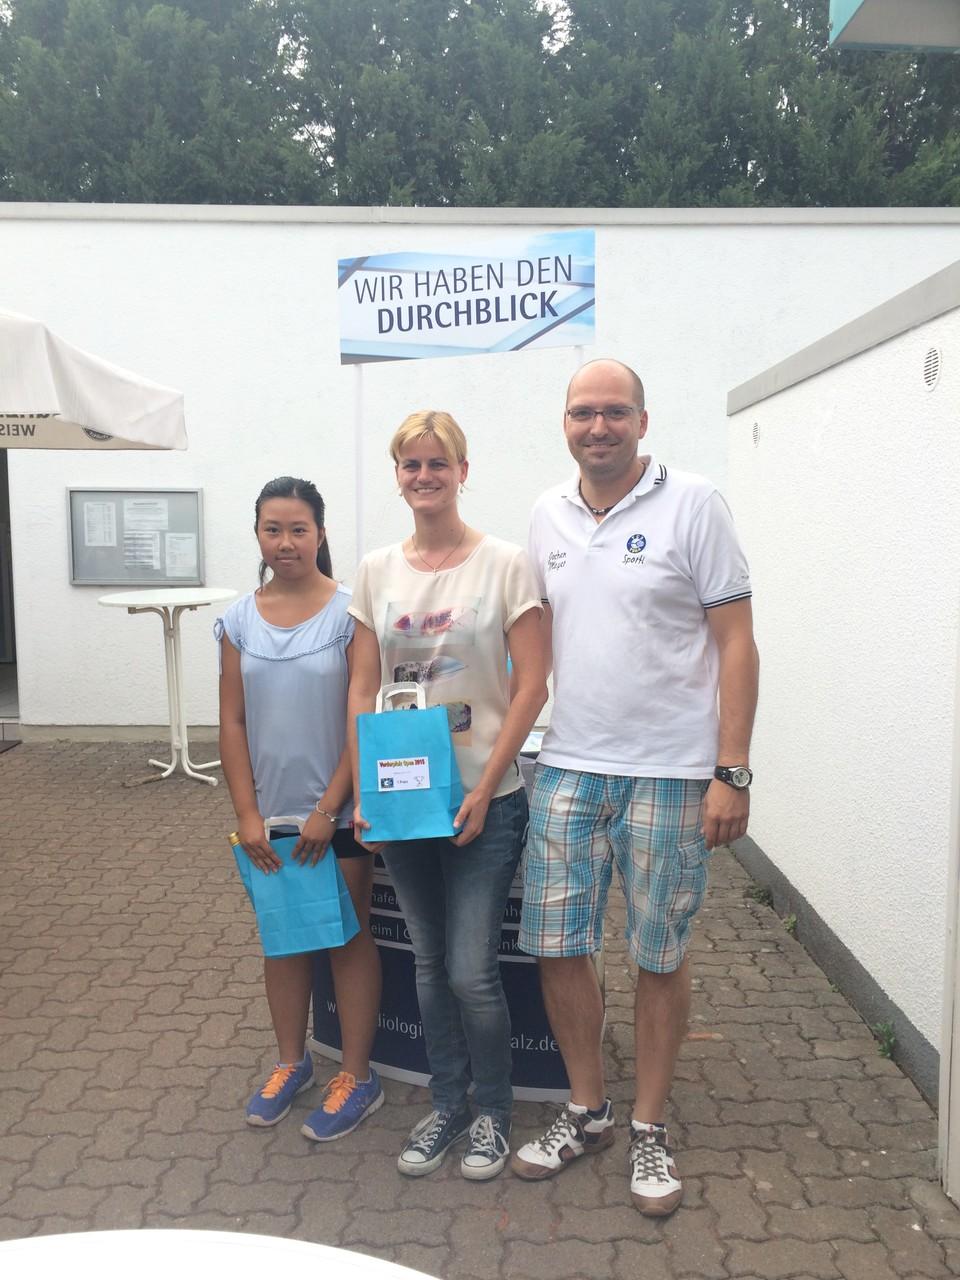 Damen LK 11-18: v.l. 2.Thanh-Thanh Nguyen (TC Rot-Weiss Pirmasens), Siegerin Jeanette Ludwicki (TC Hasloch)